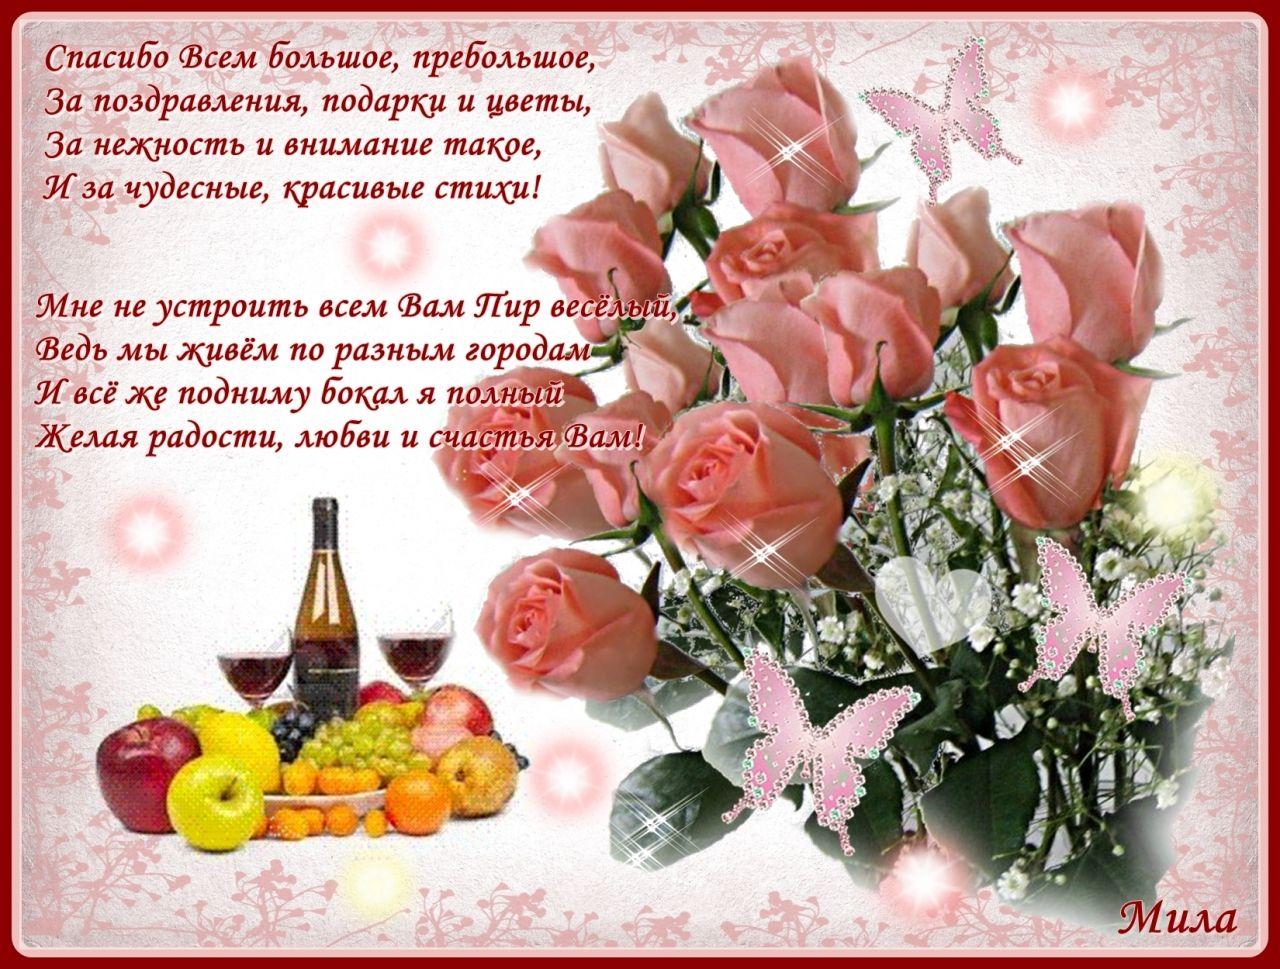 Цвета роз с фотографиями